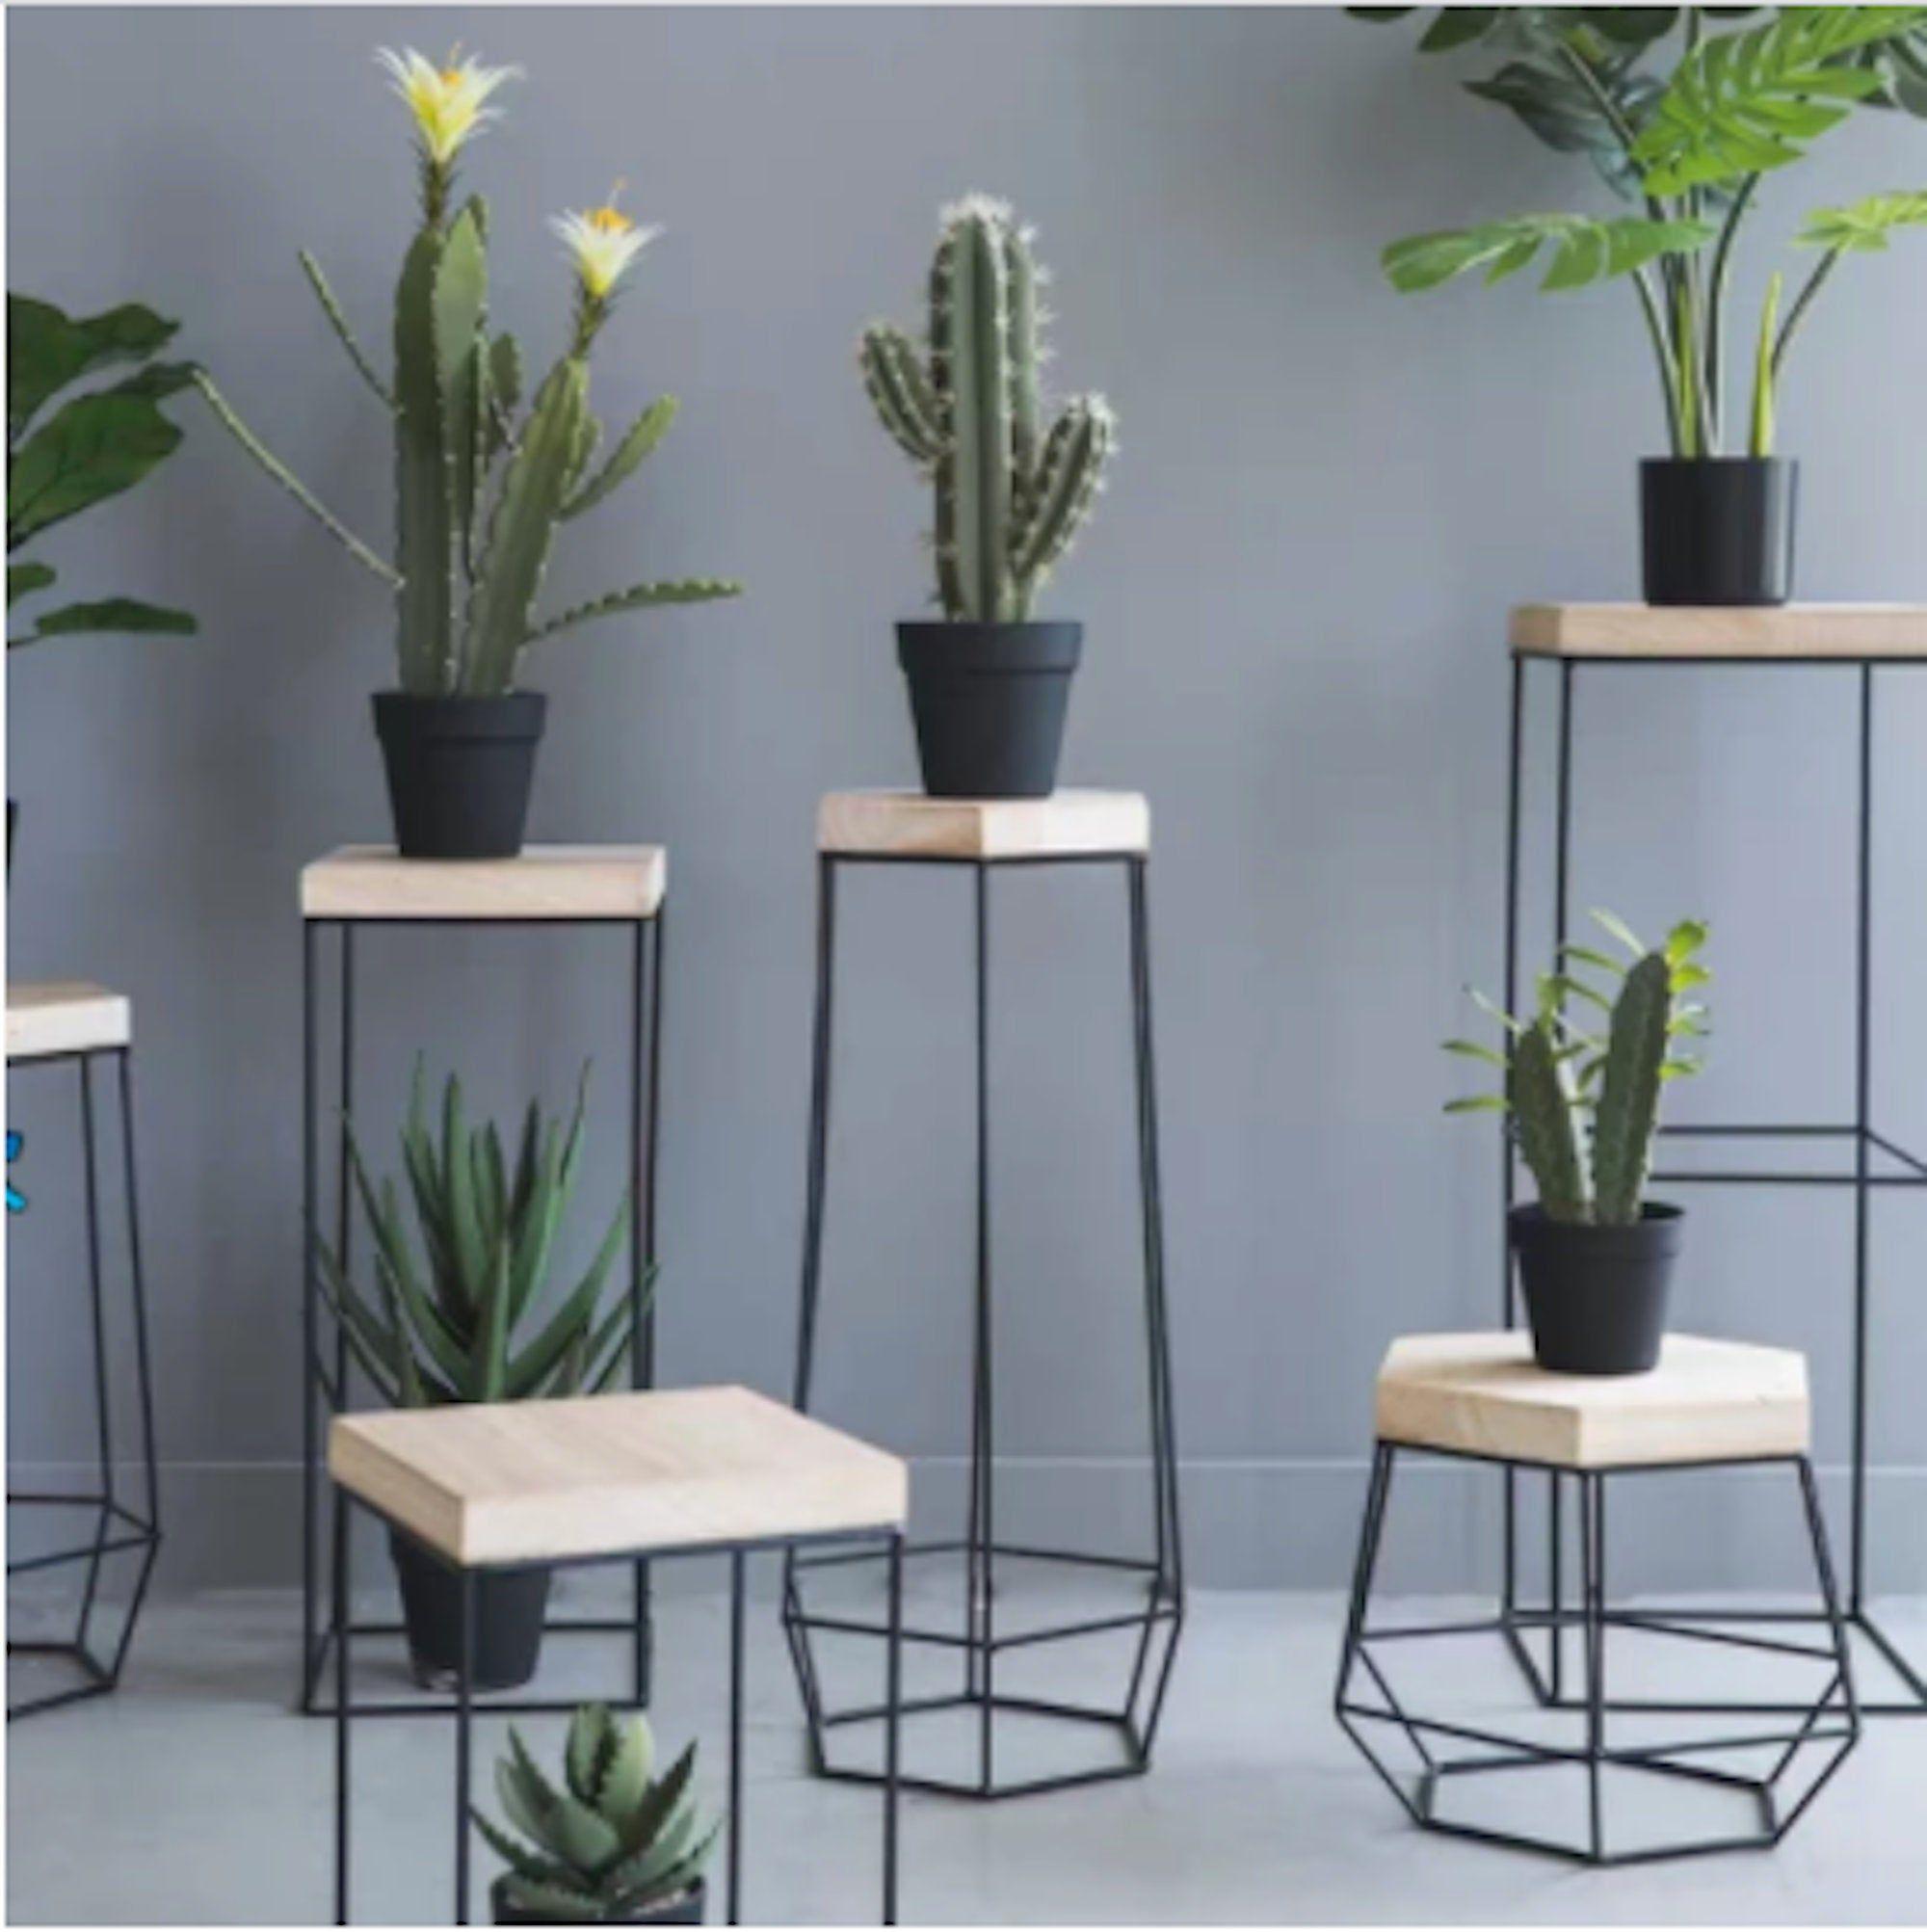 Handmade Metal Plant Stand for Home,Terrace & Office Decor. Modern Geometric Steel Frame in Gold/Black Polish,Solid Wood Sturdy Flower Rack.